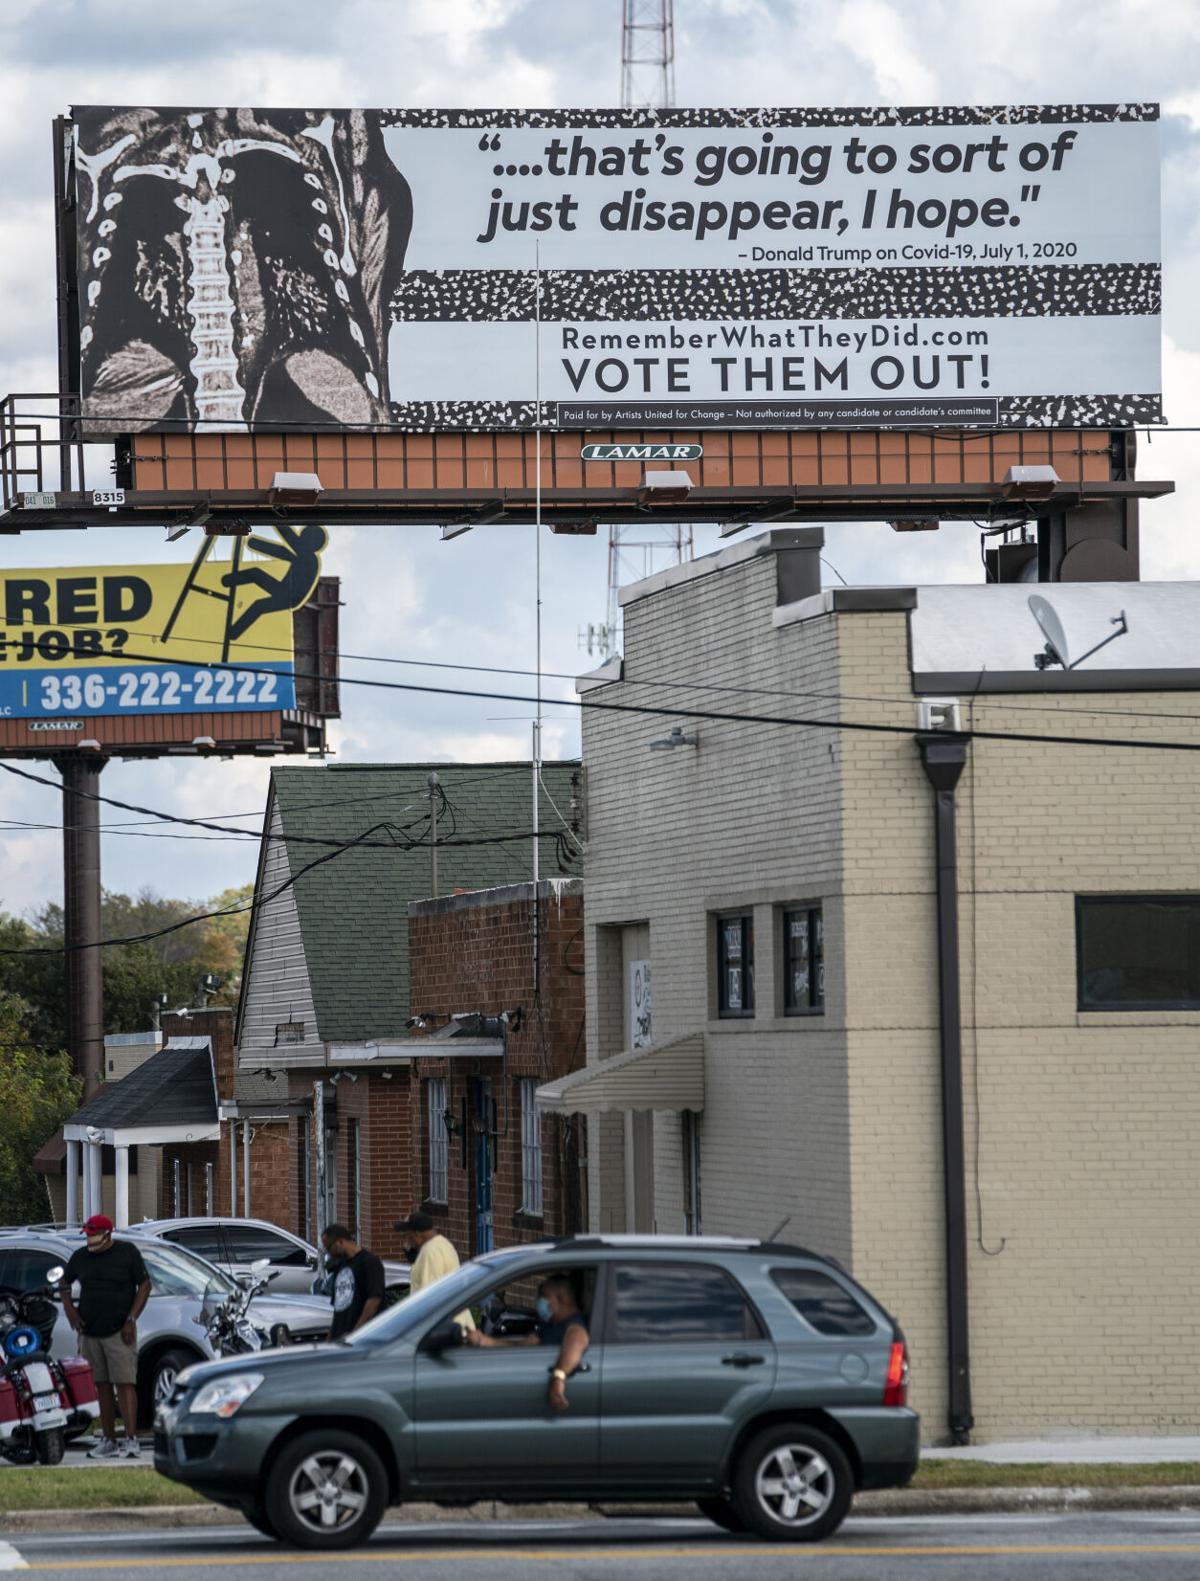 Anti-Trump billboards in Greensboro